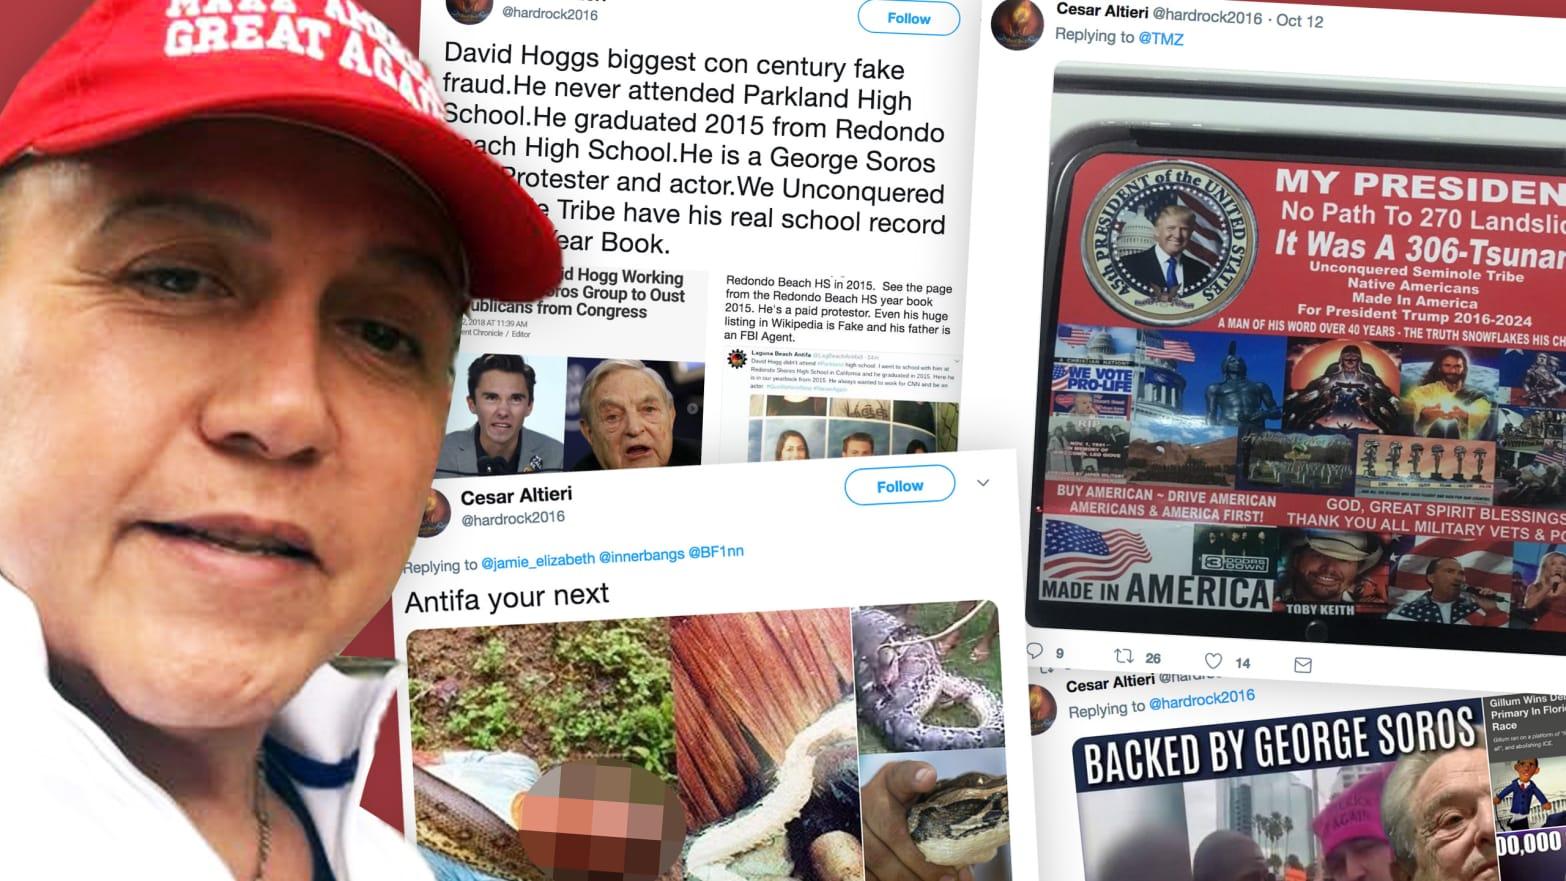 Cesar Sayoc Jr , Alleged Mail Bomber, Threatened Democrats on Twitter